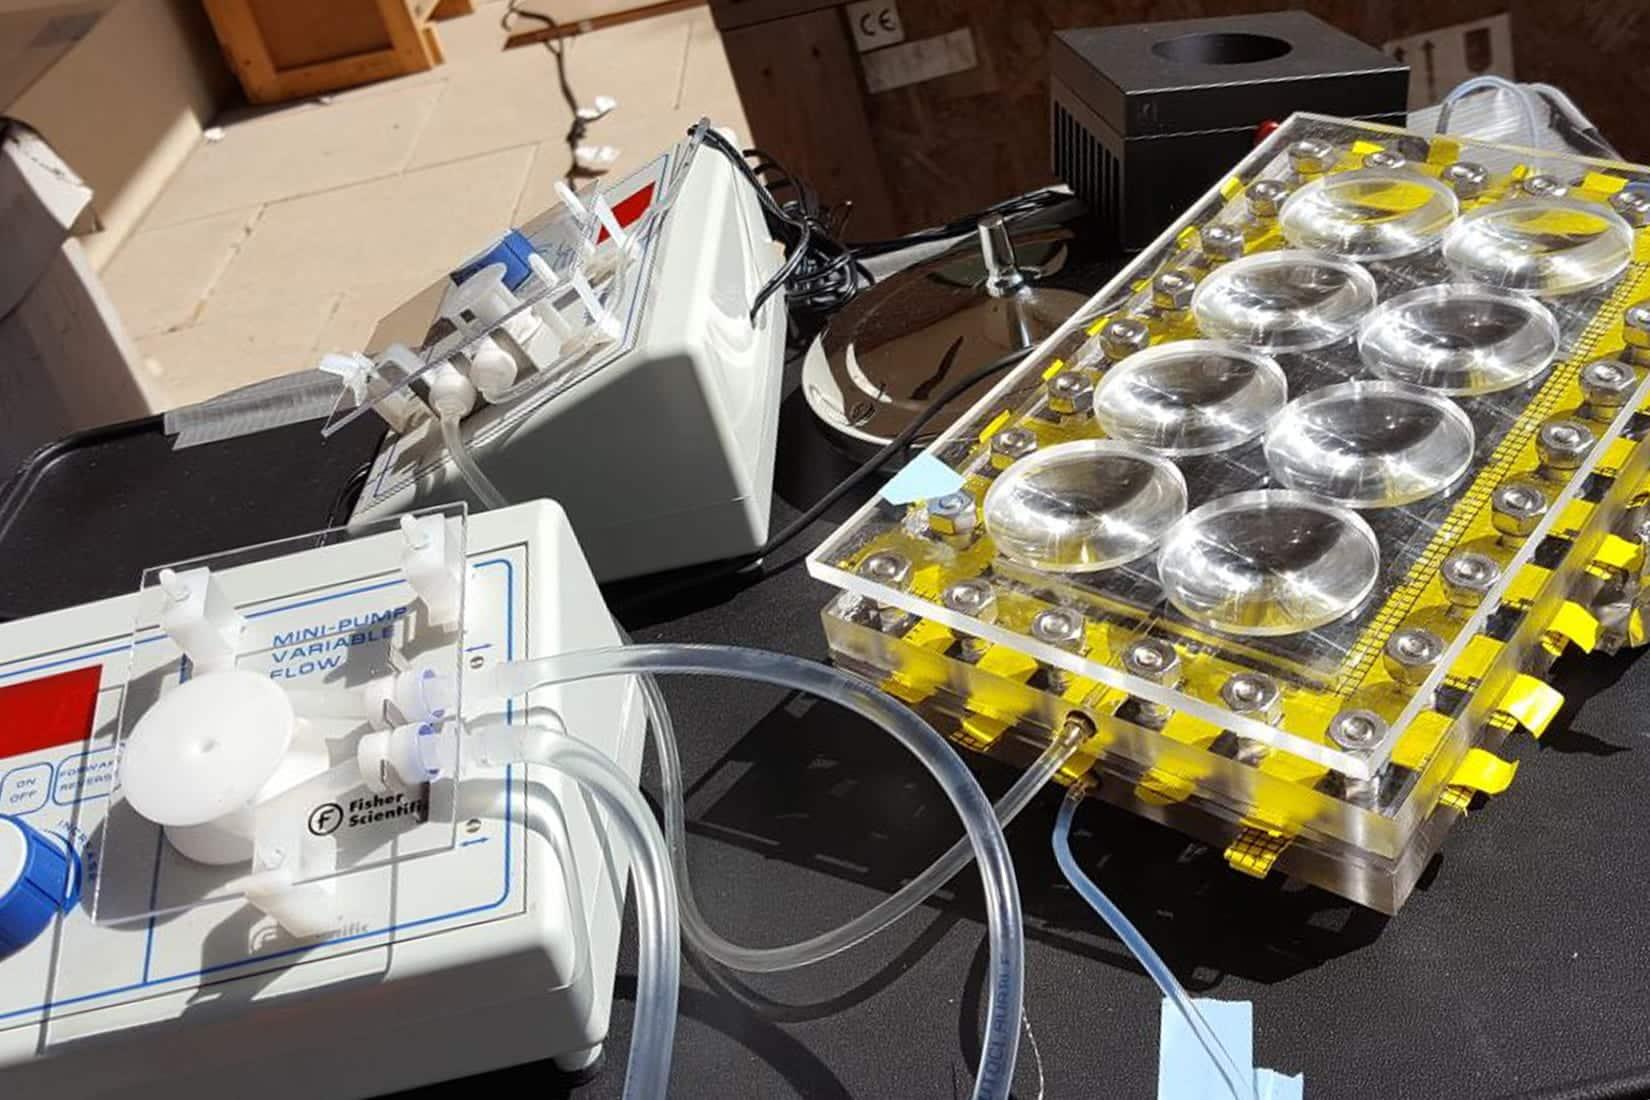 solar-powered desalination set-up